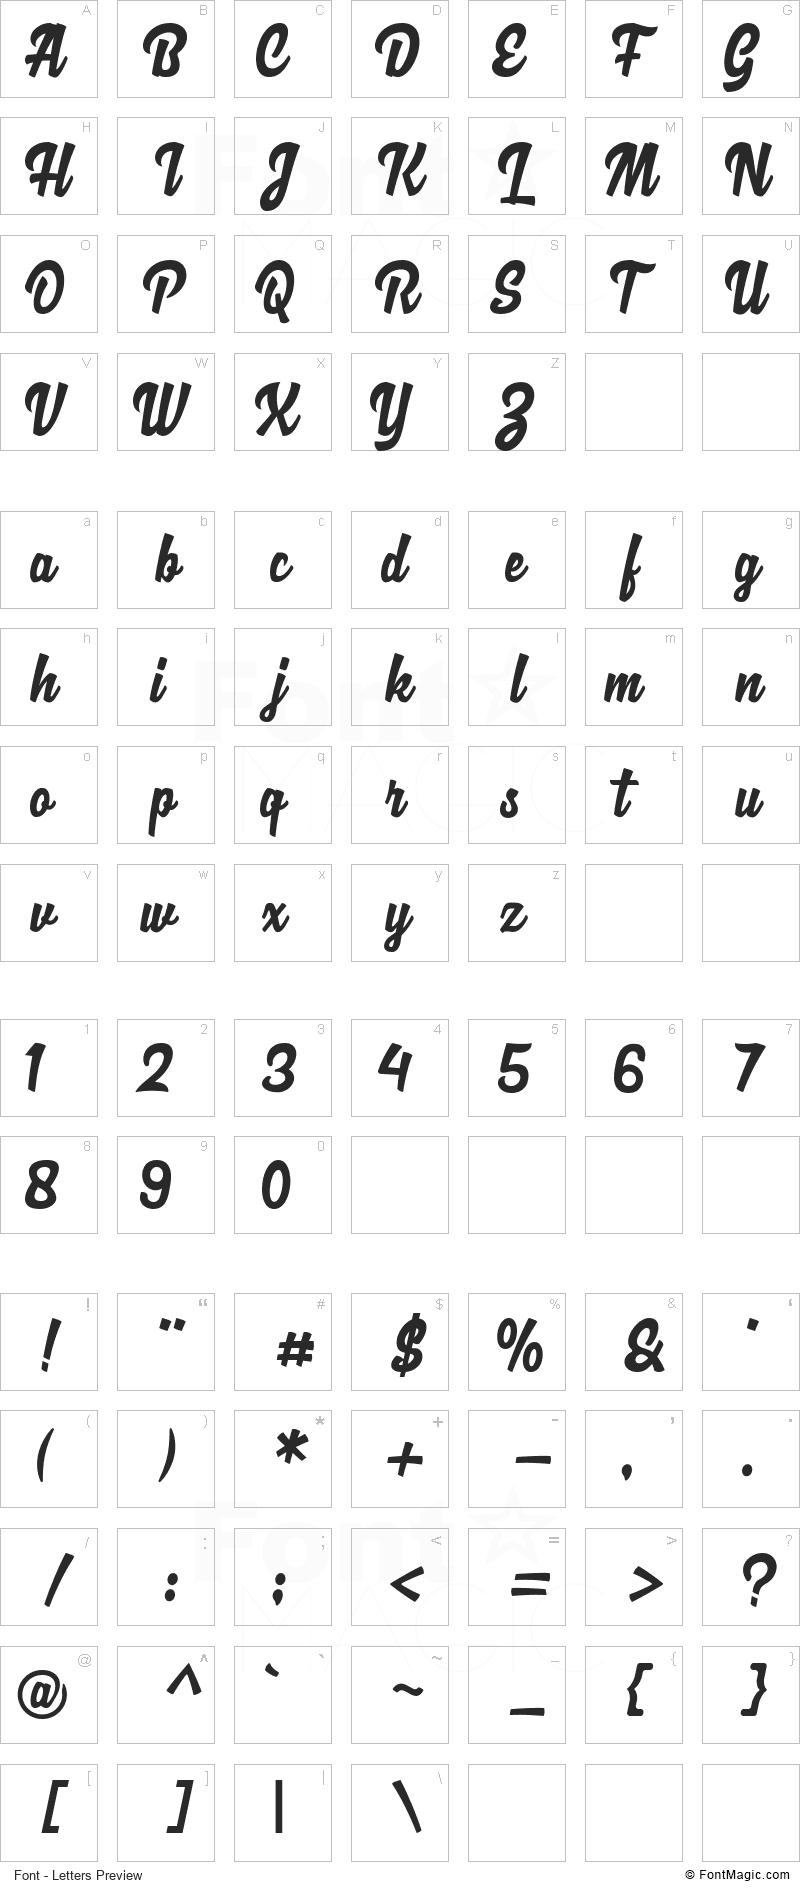 Loguetown Font - All Latters Preview Chart